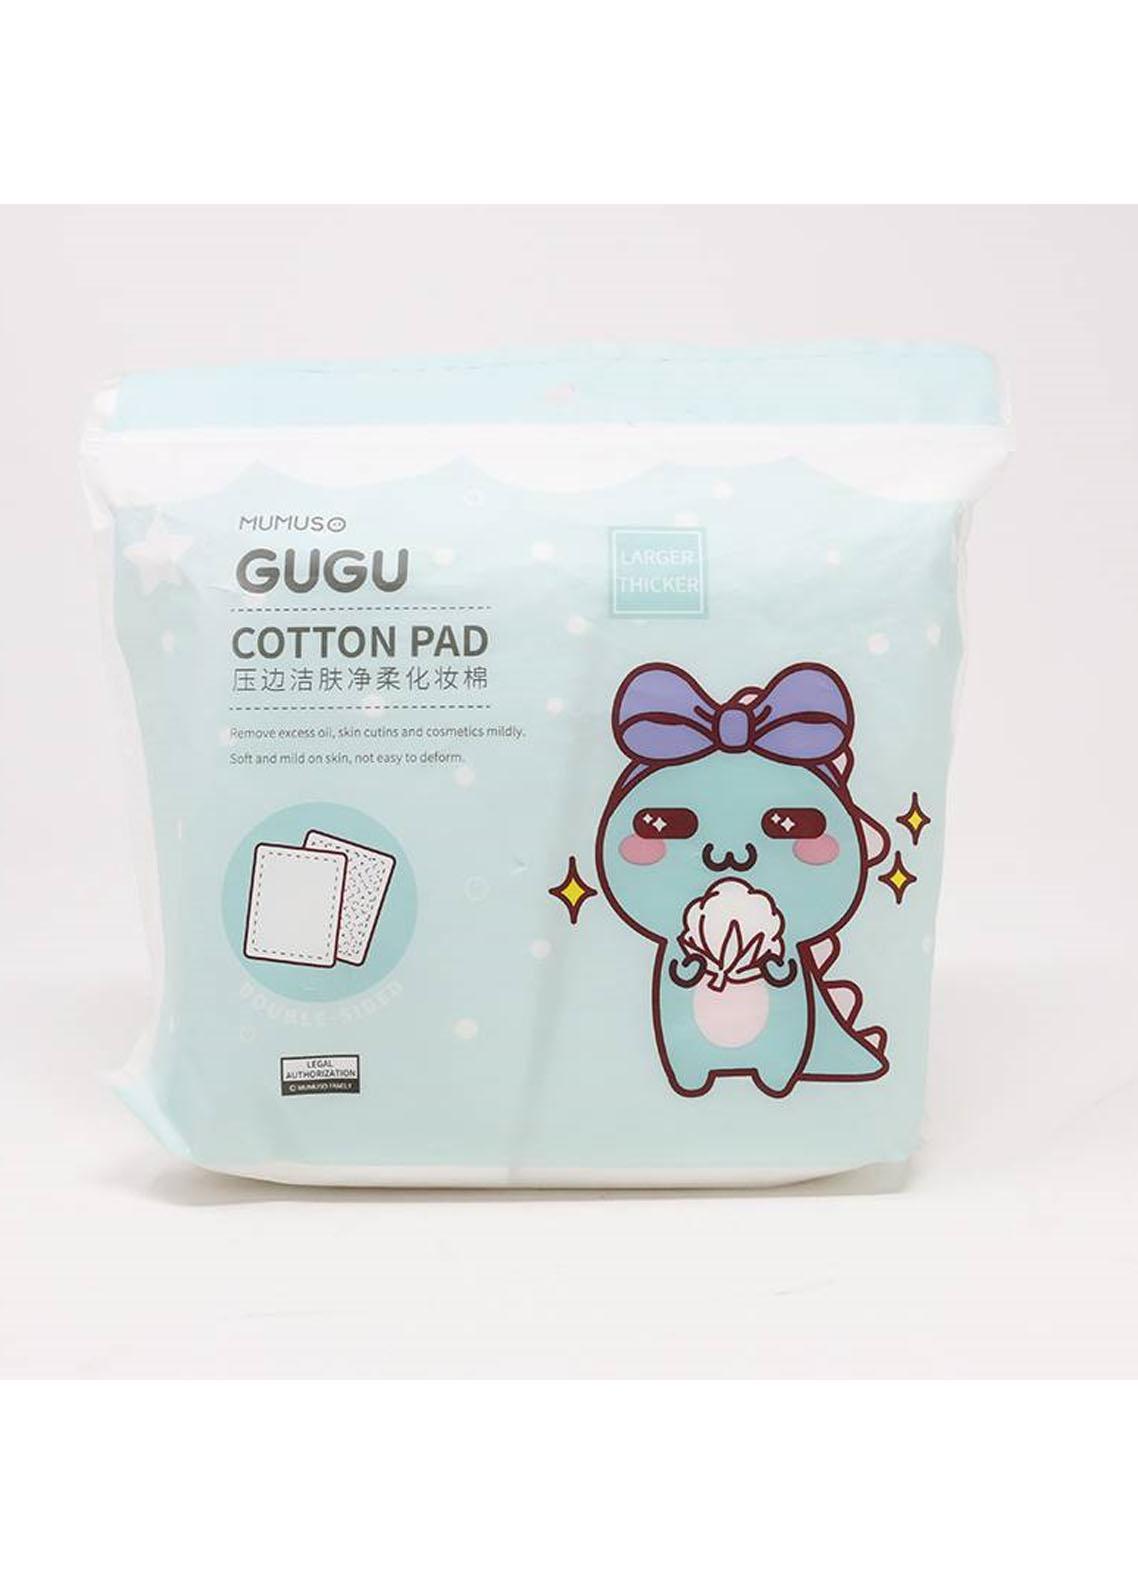 Mumuso GUGU 100PCS SOFT SKIN CLEANSING COTTON PAD